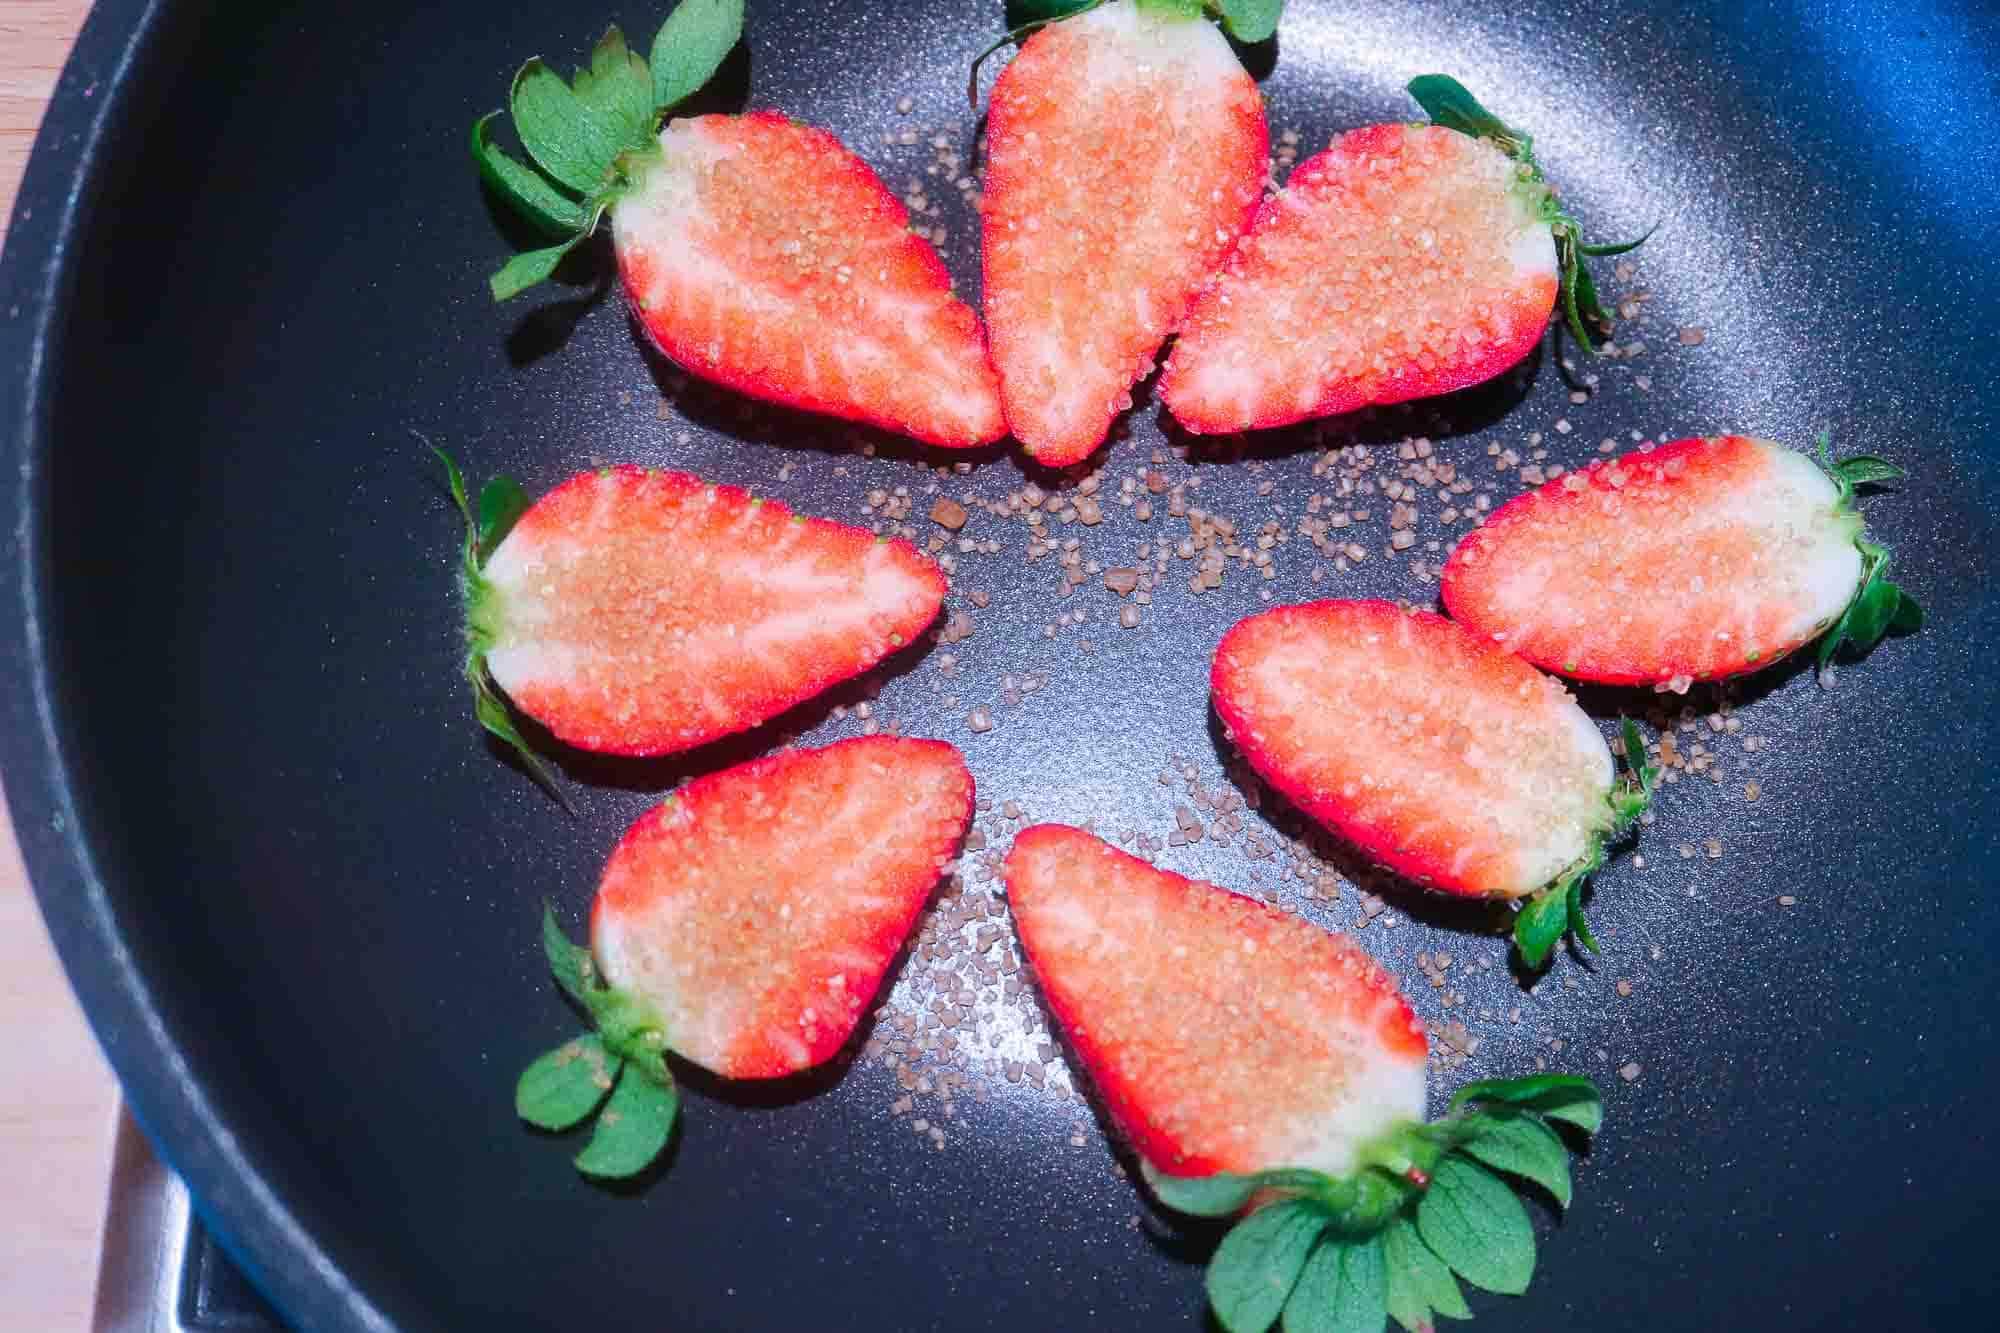 Erdbeeren für Erdbeerrisotto als Dekoration vorbereiten